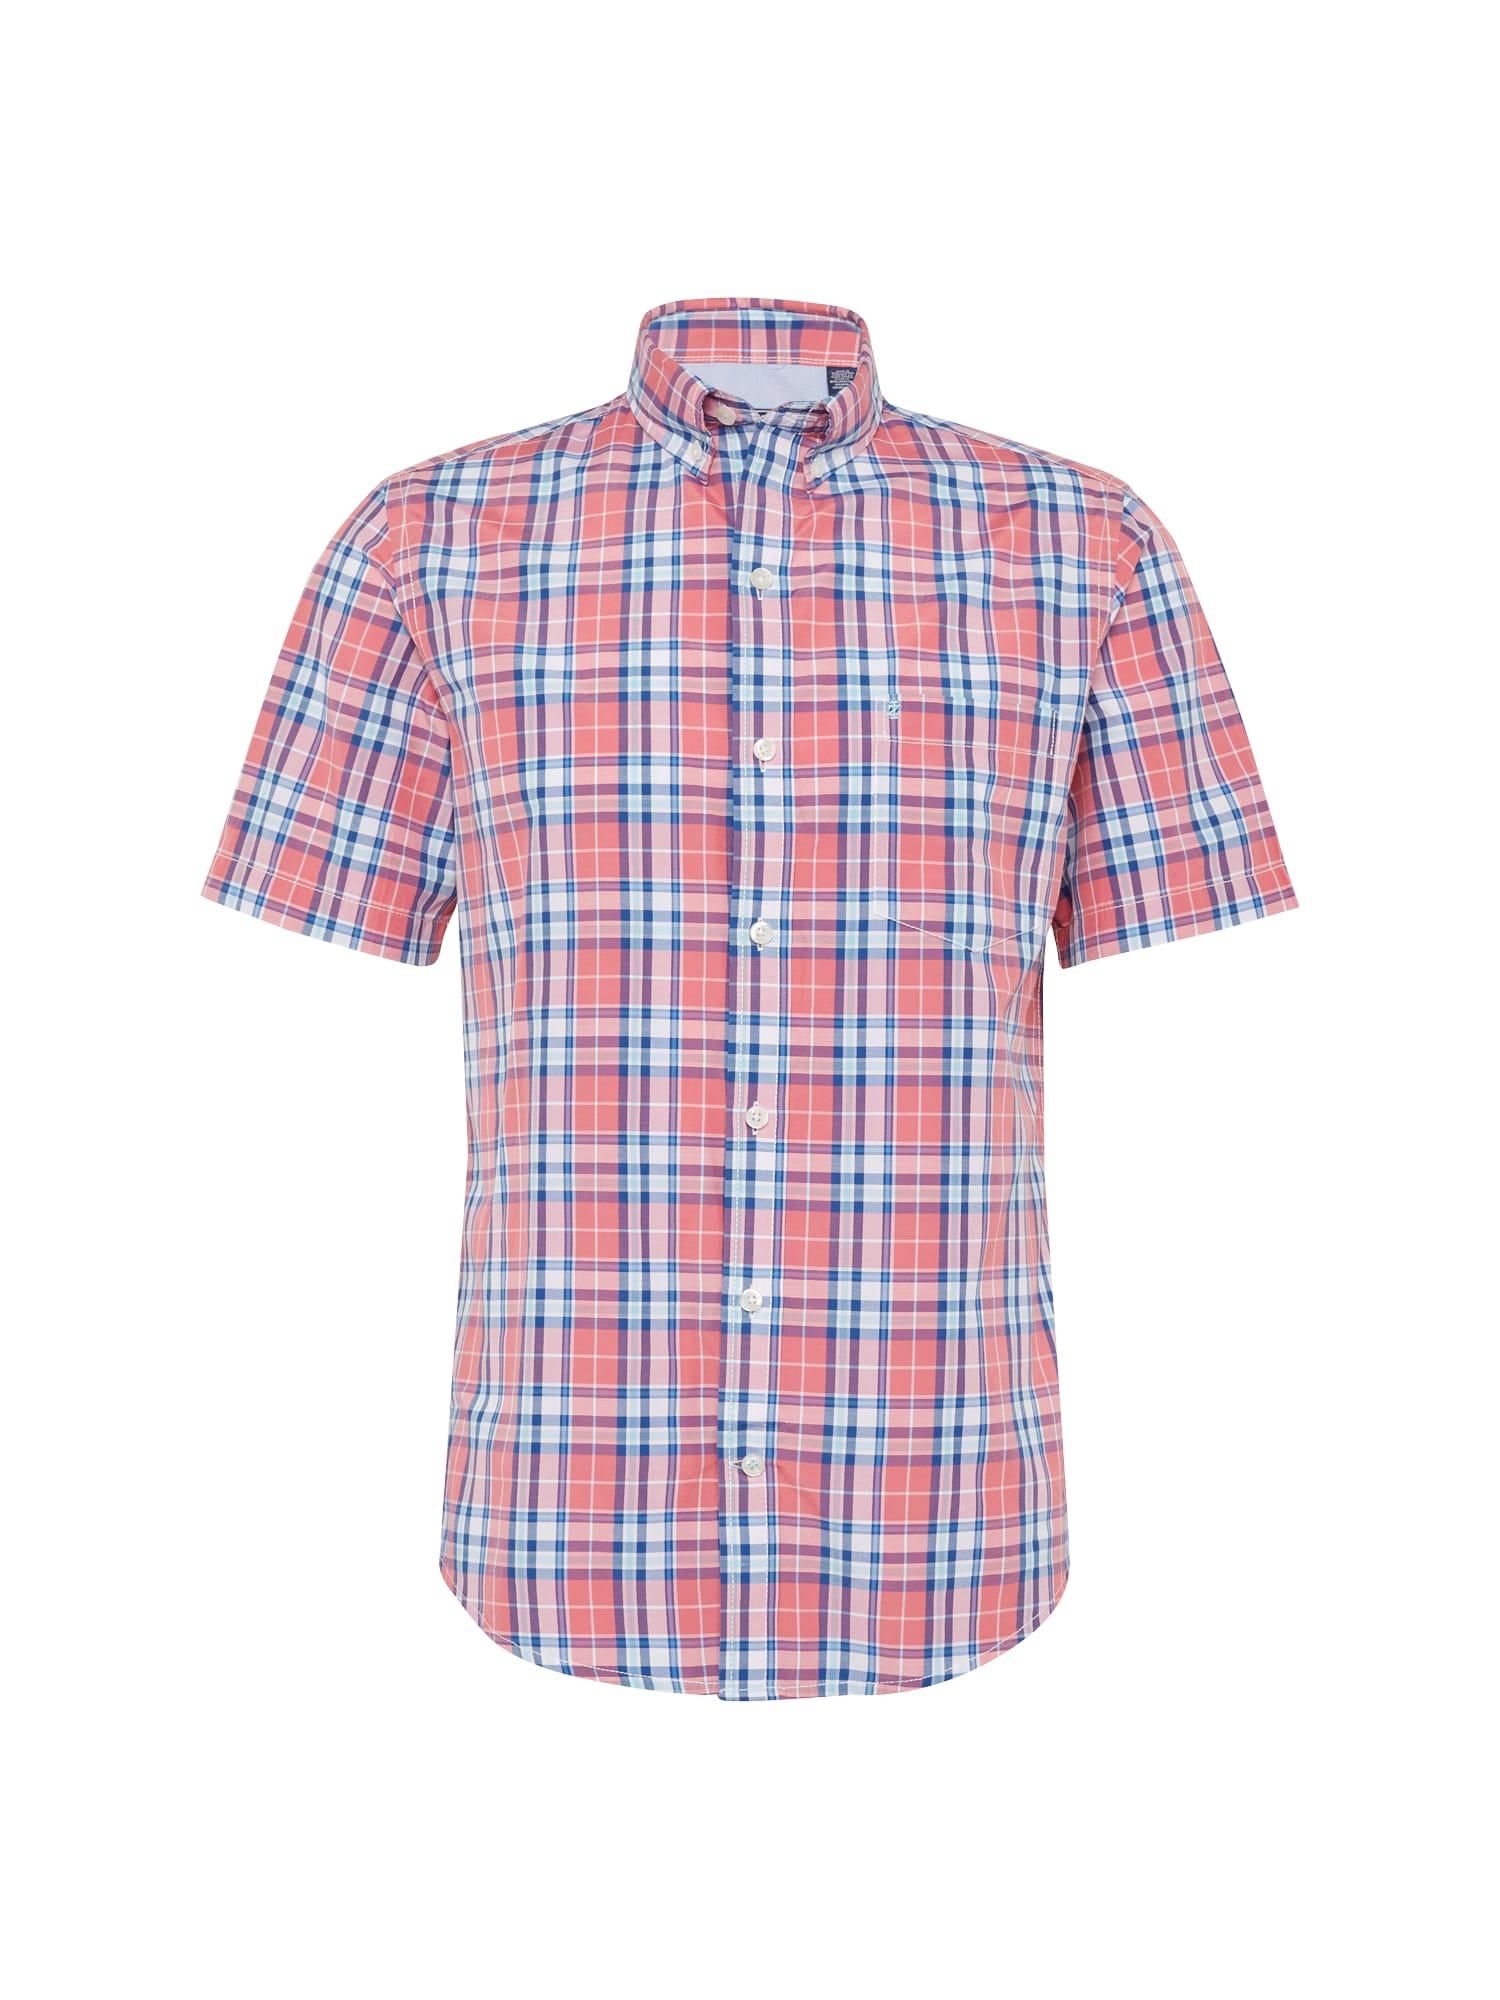 Košile BREEZE POPLIN PLAID modrá červená bílá IZOD